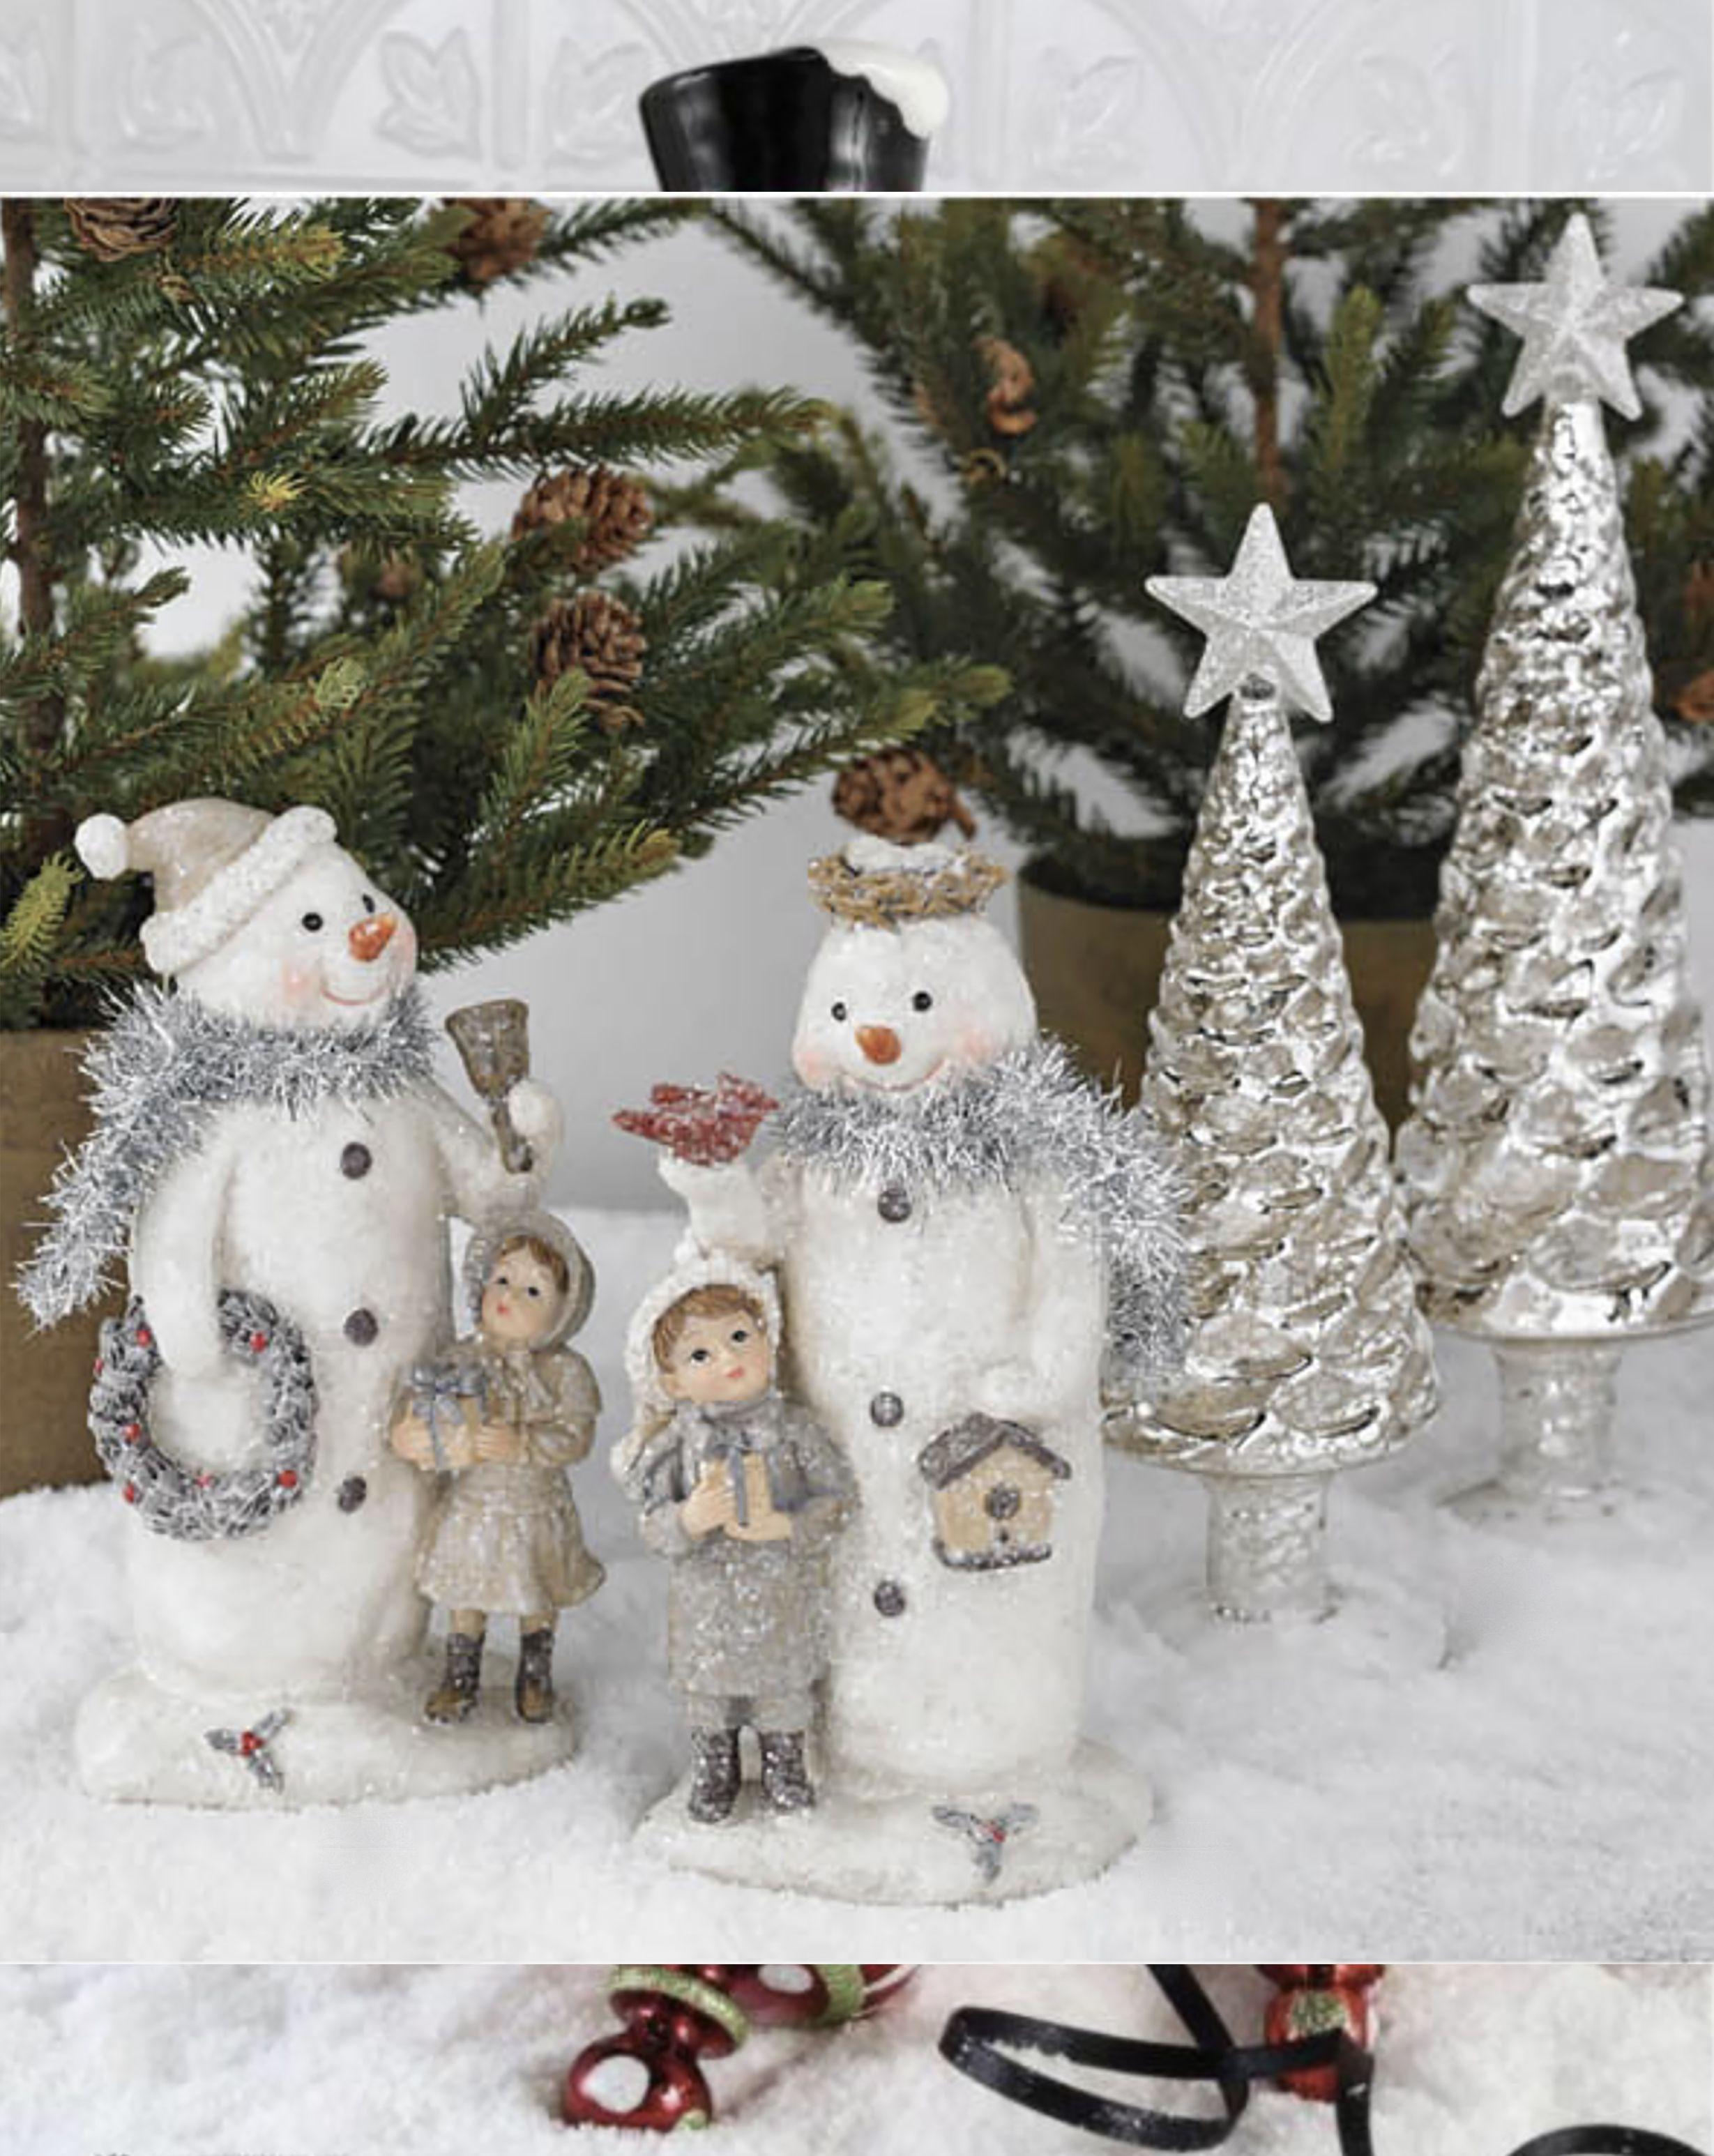 Pin by WhatNotGems on Christmas Whatnot Pinterest